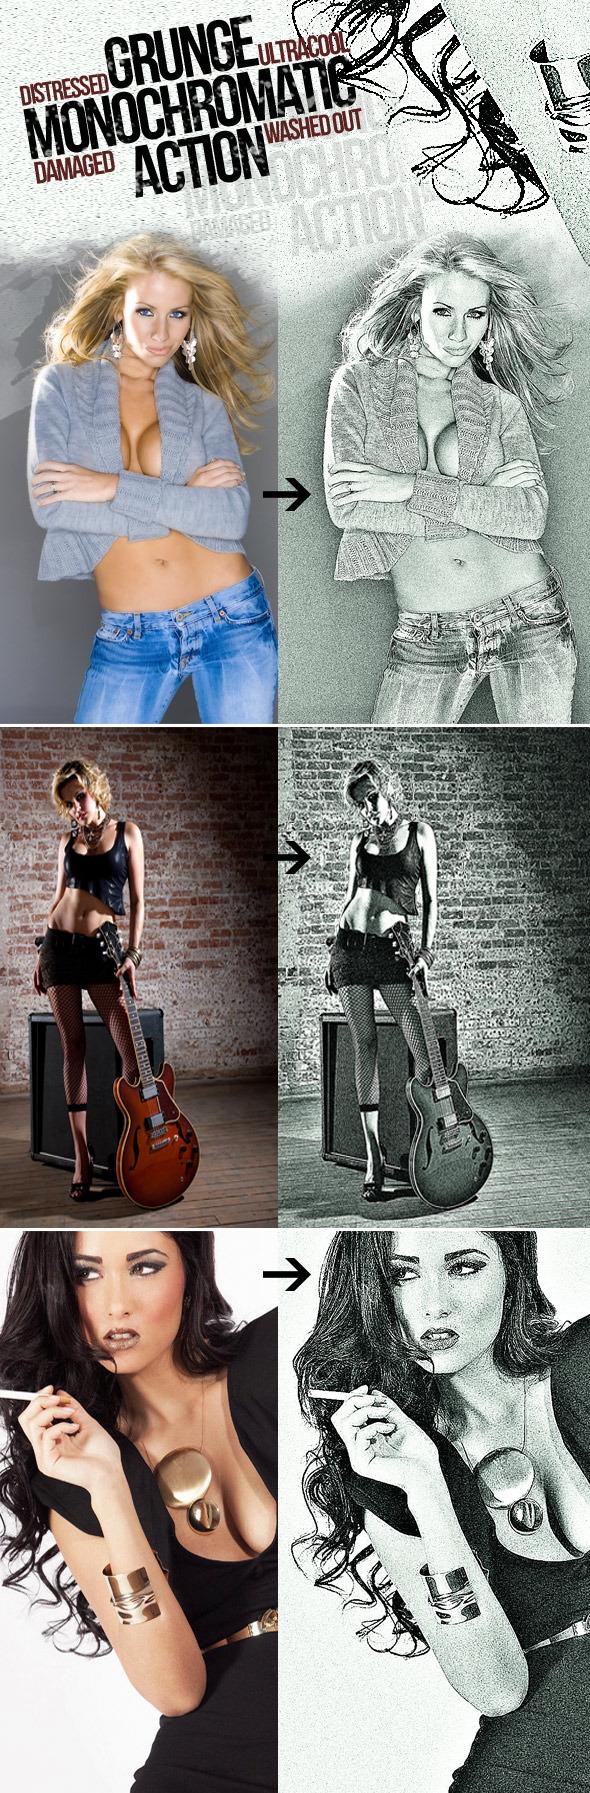 "Photoshop Action ""Grunge Monochromatic"" - Photoshop Add-ons"